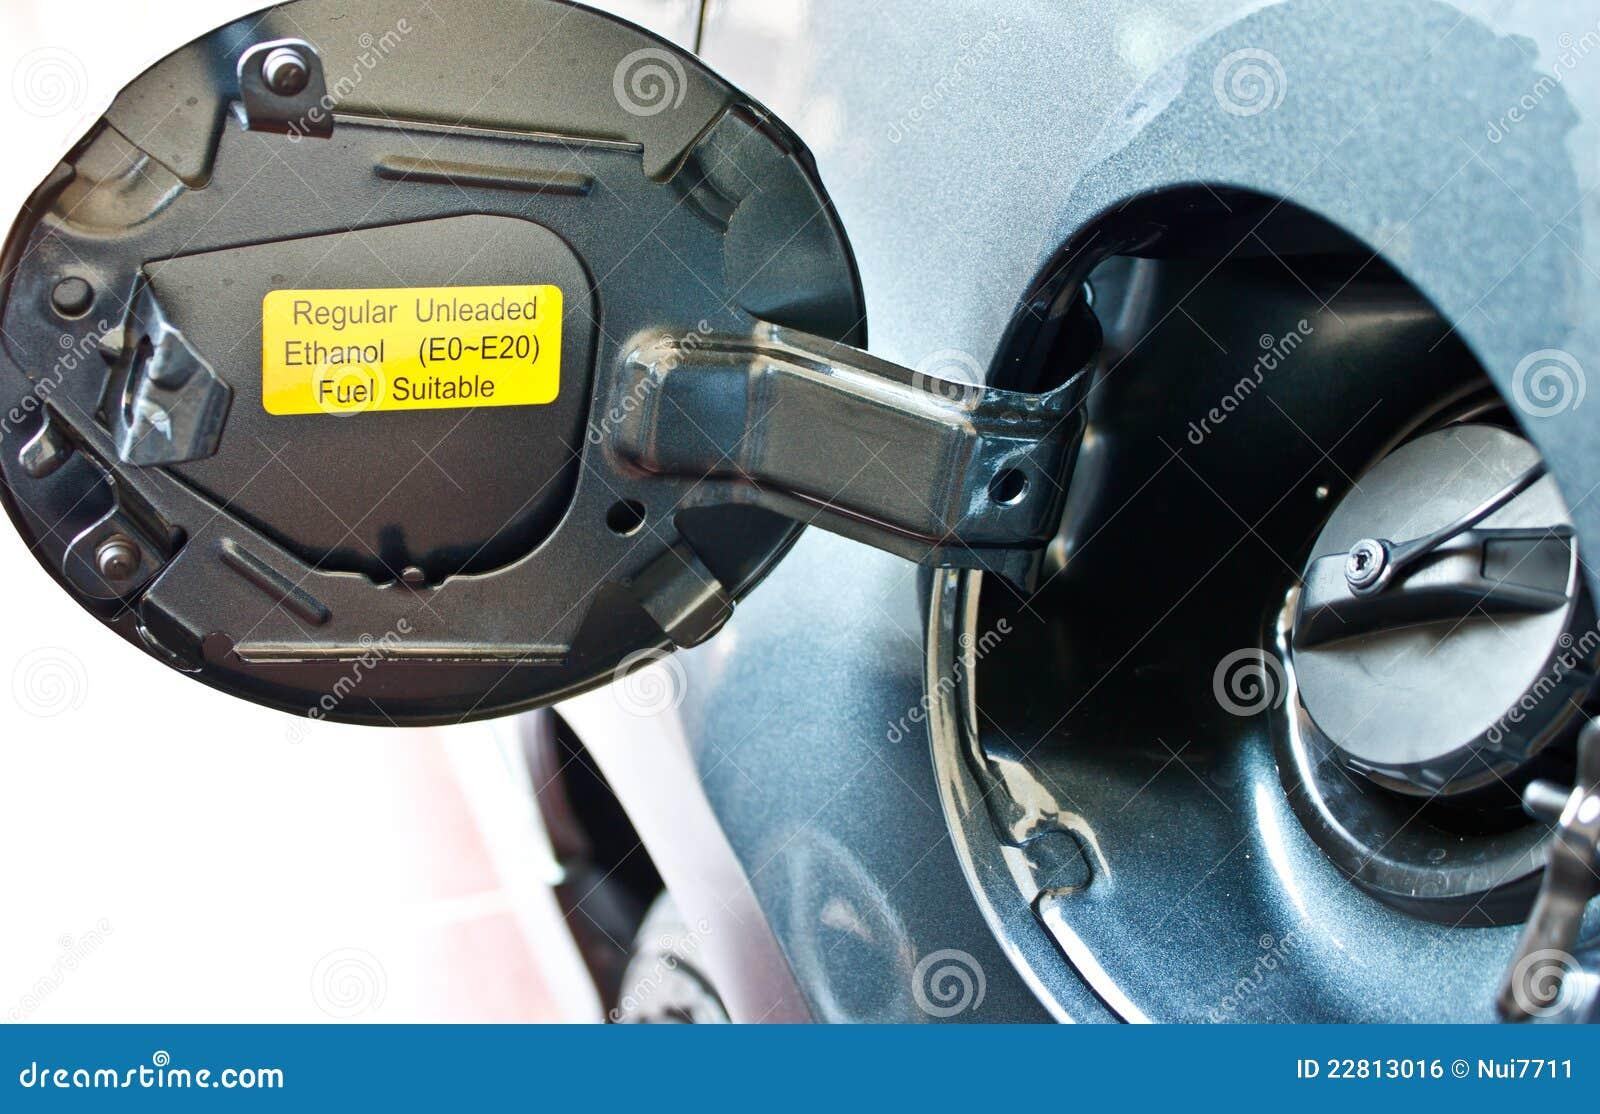 Automotive Gas Cap : Car gas cap royalty free stock image